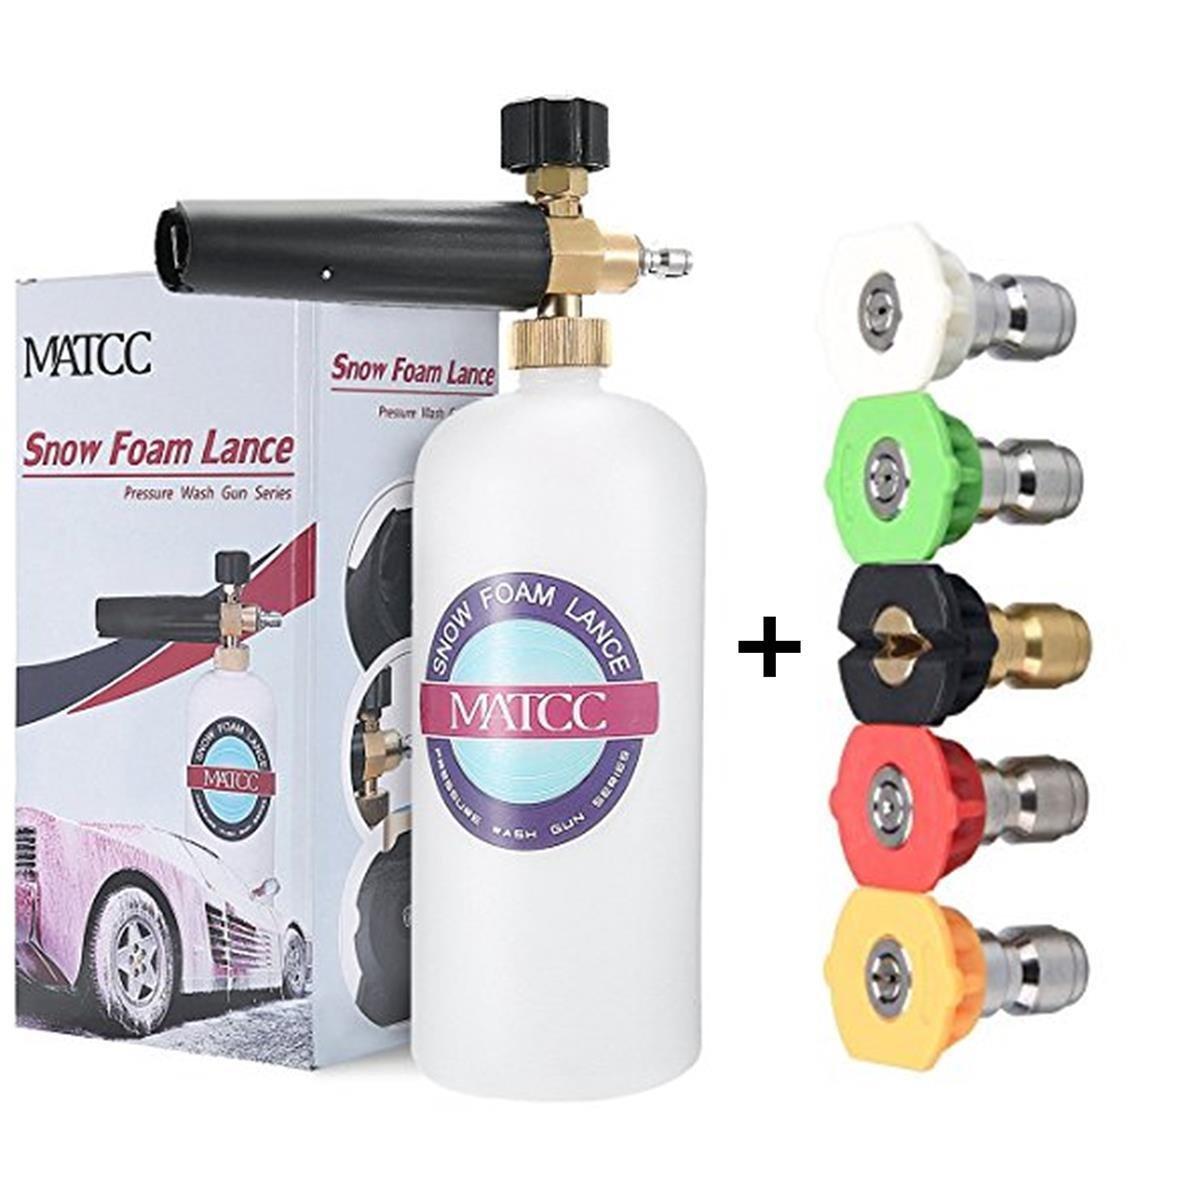 MATCC Adjustable Foam Cannon Bottle Snow Foam Lance with 1/4Inch Quick Connector